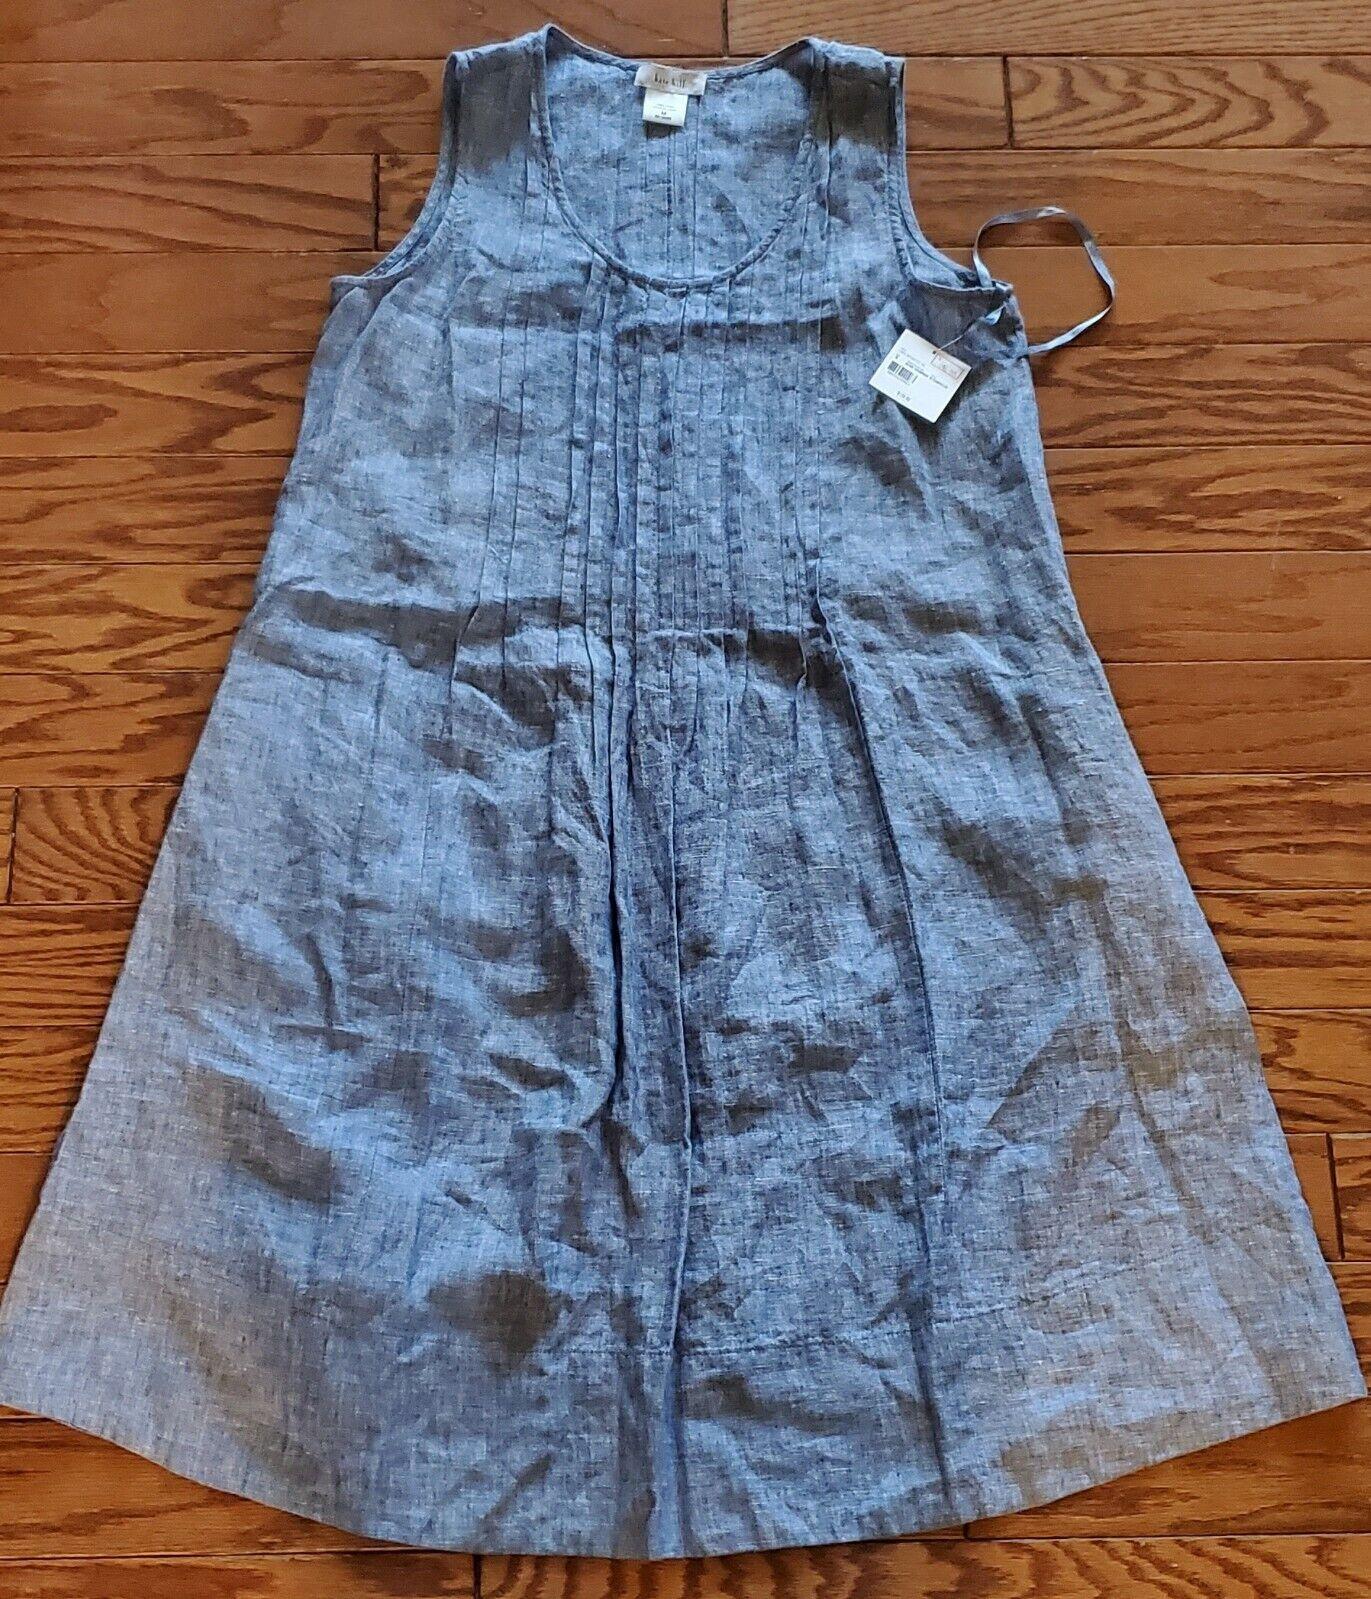 Kate Hill 100% Linen Women's Dress Azure Chambray Size M